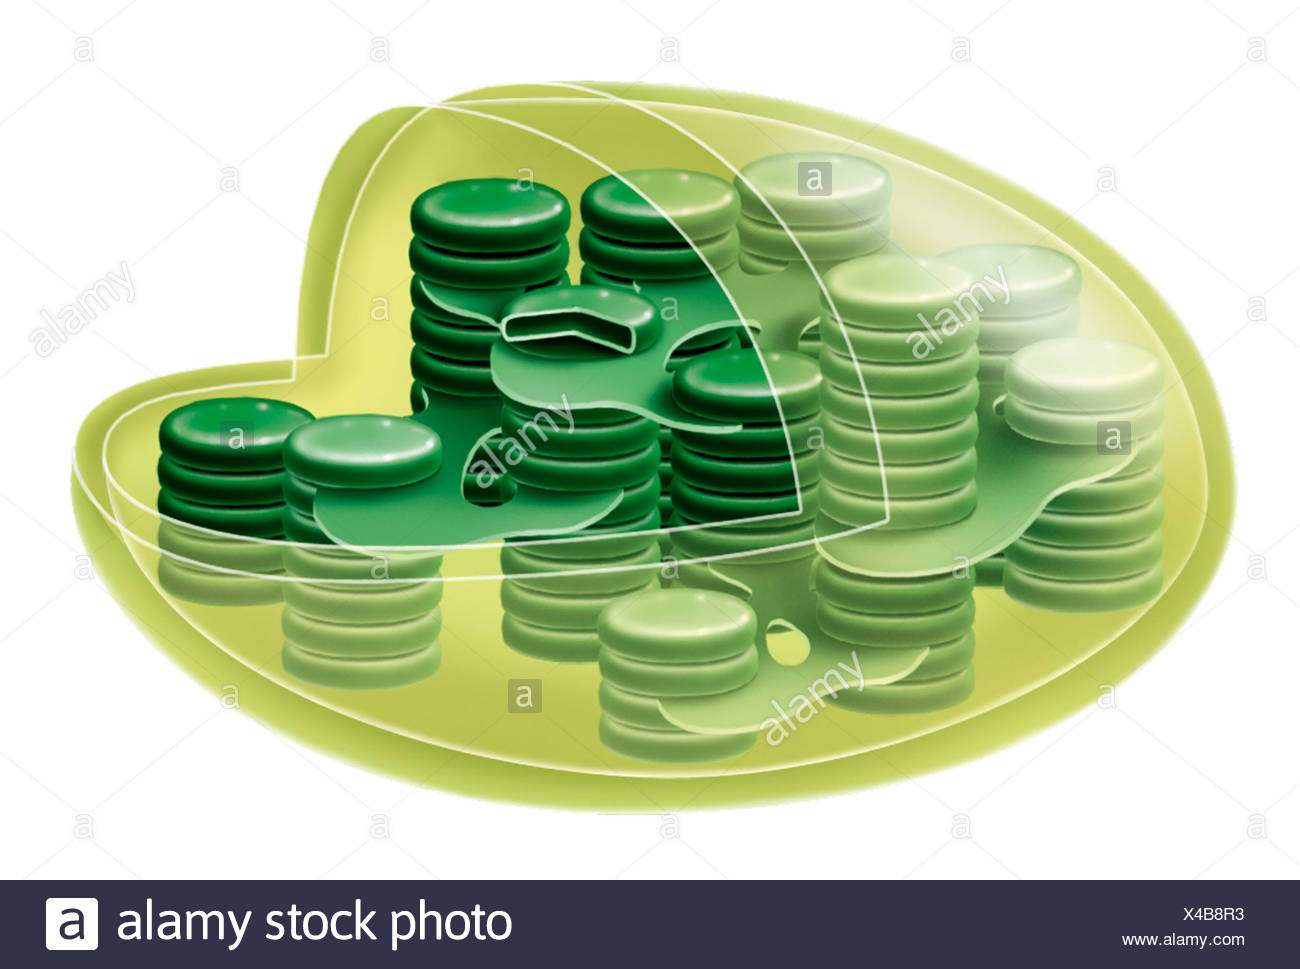 Chloroplast stock photos chloroplast stock images alamy chloroplast stock image ccuart Images